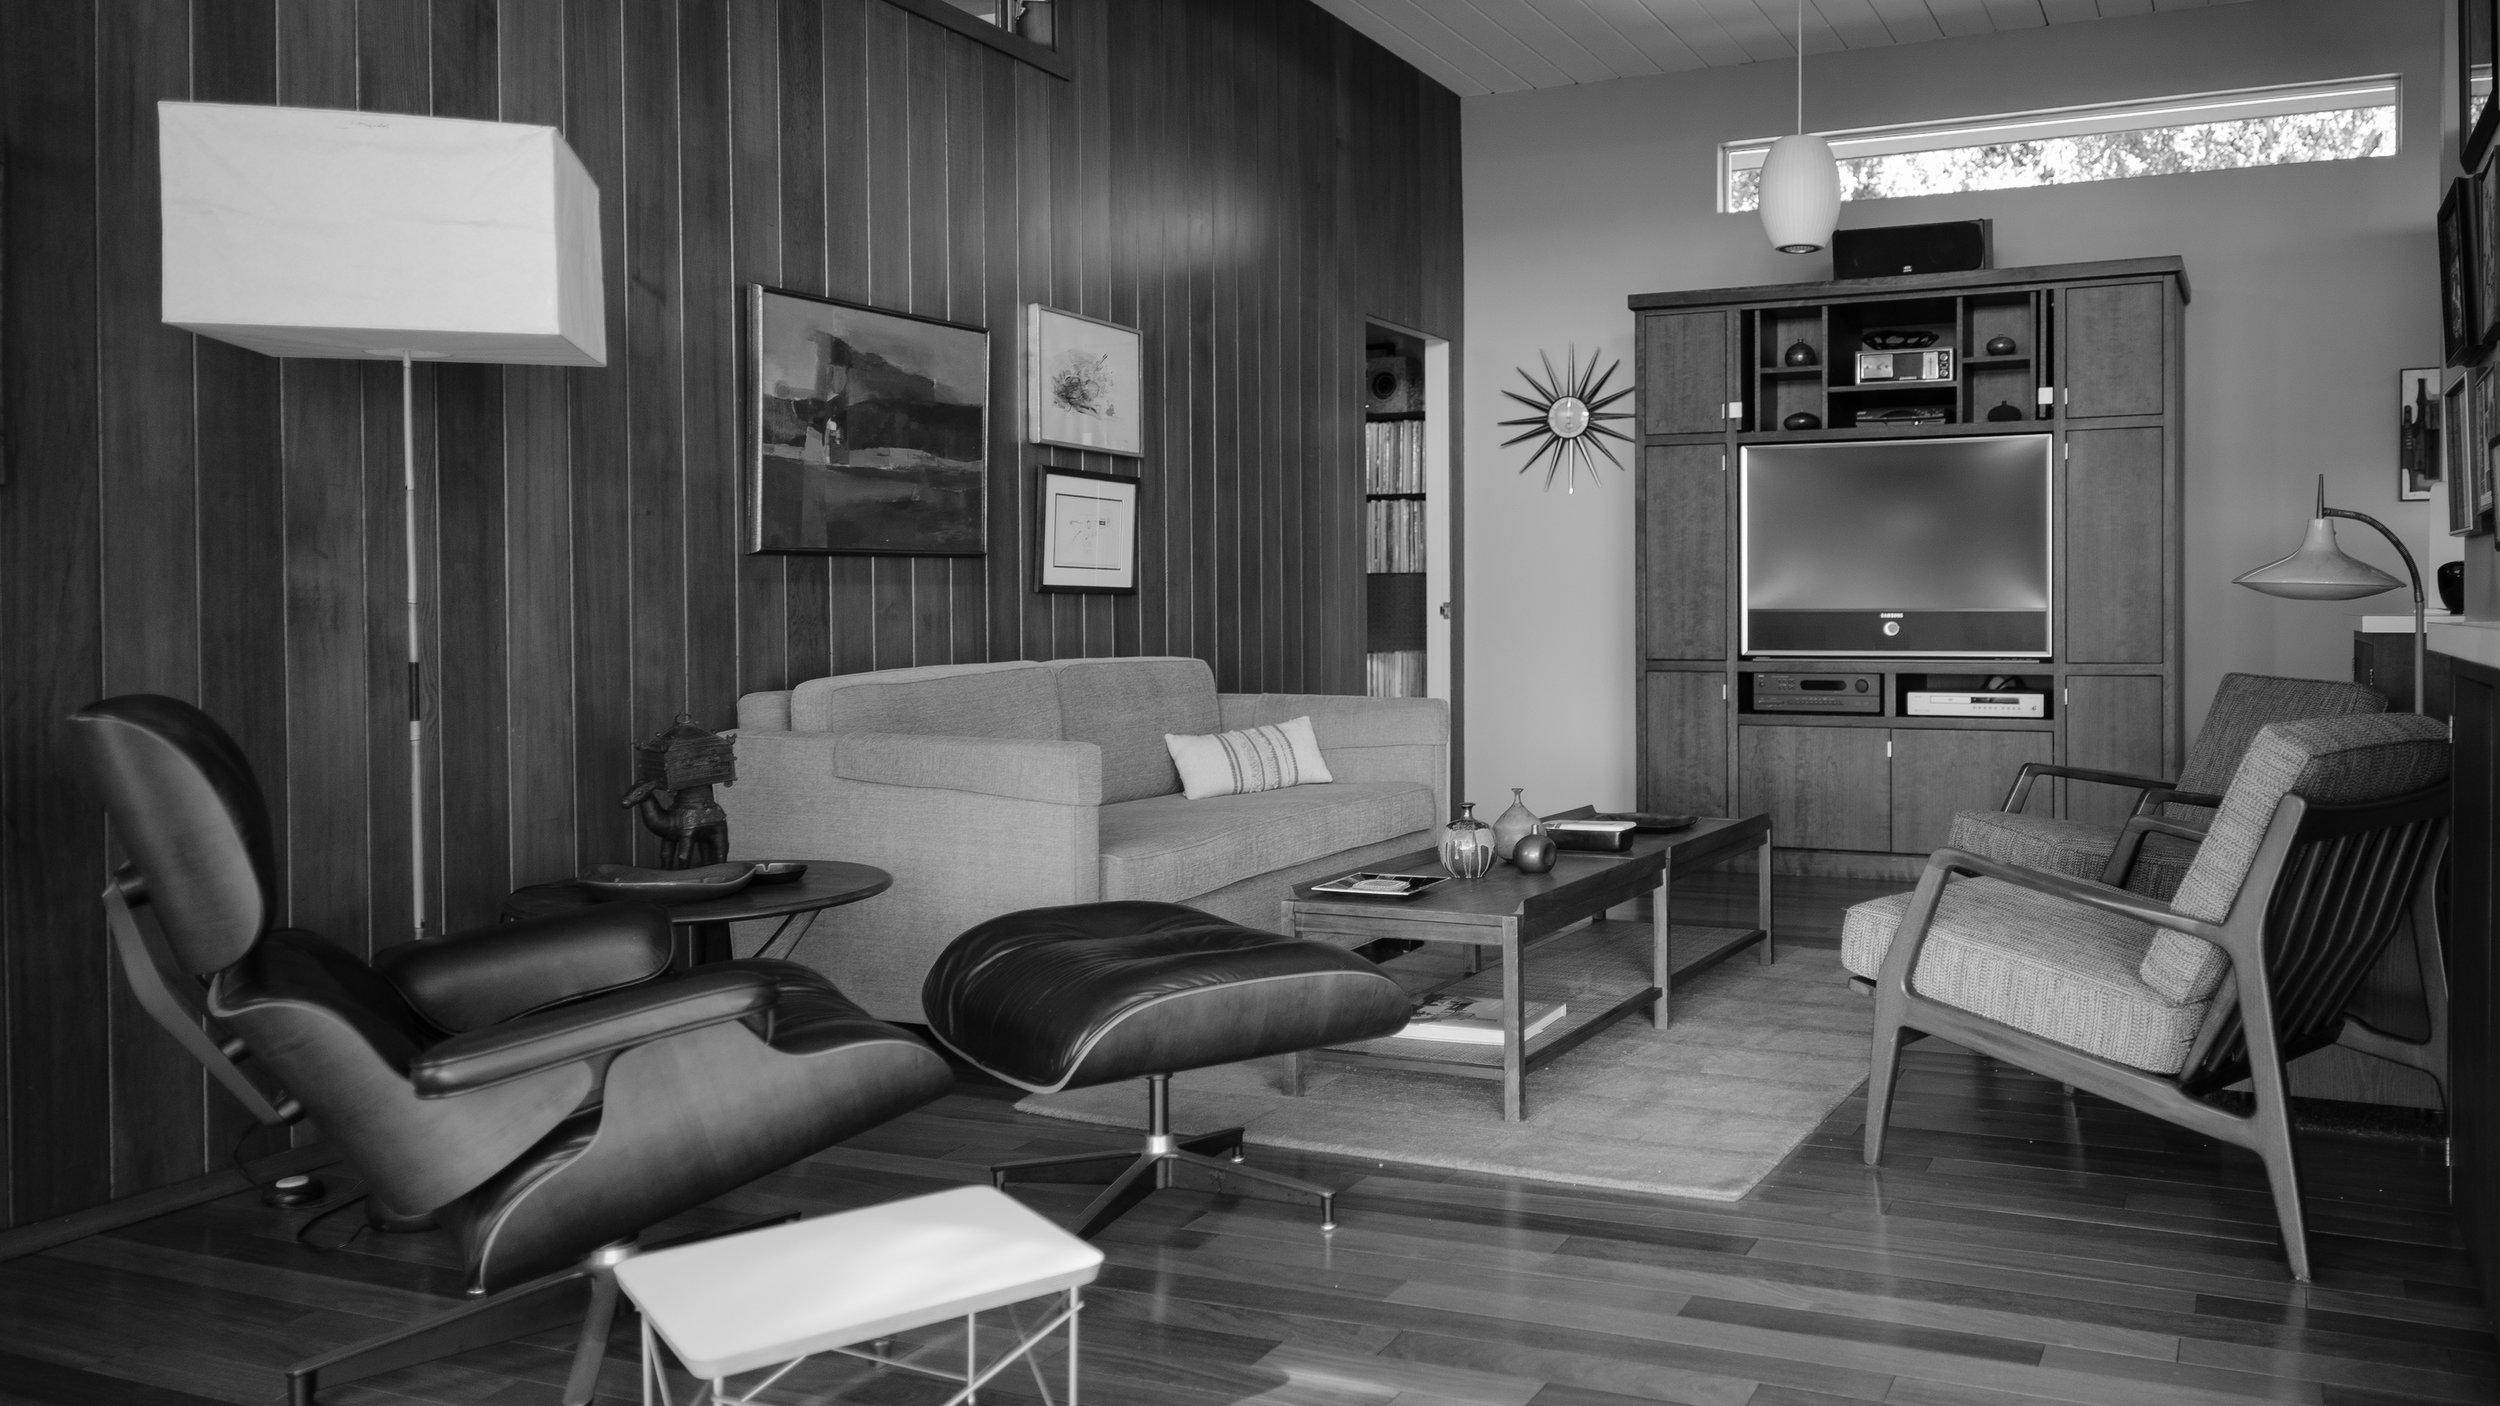 Ullman residence. John Mock, 1964